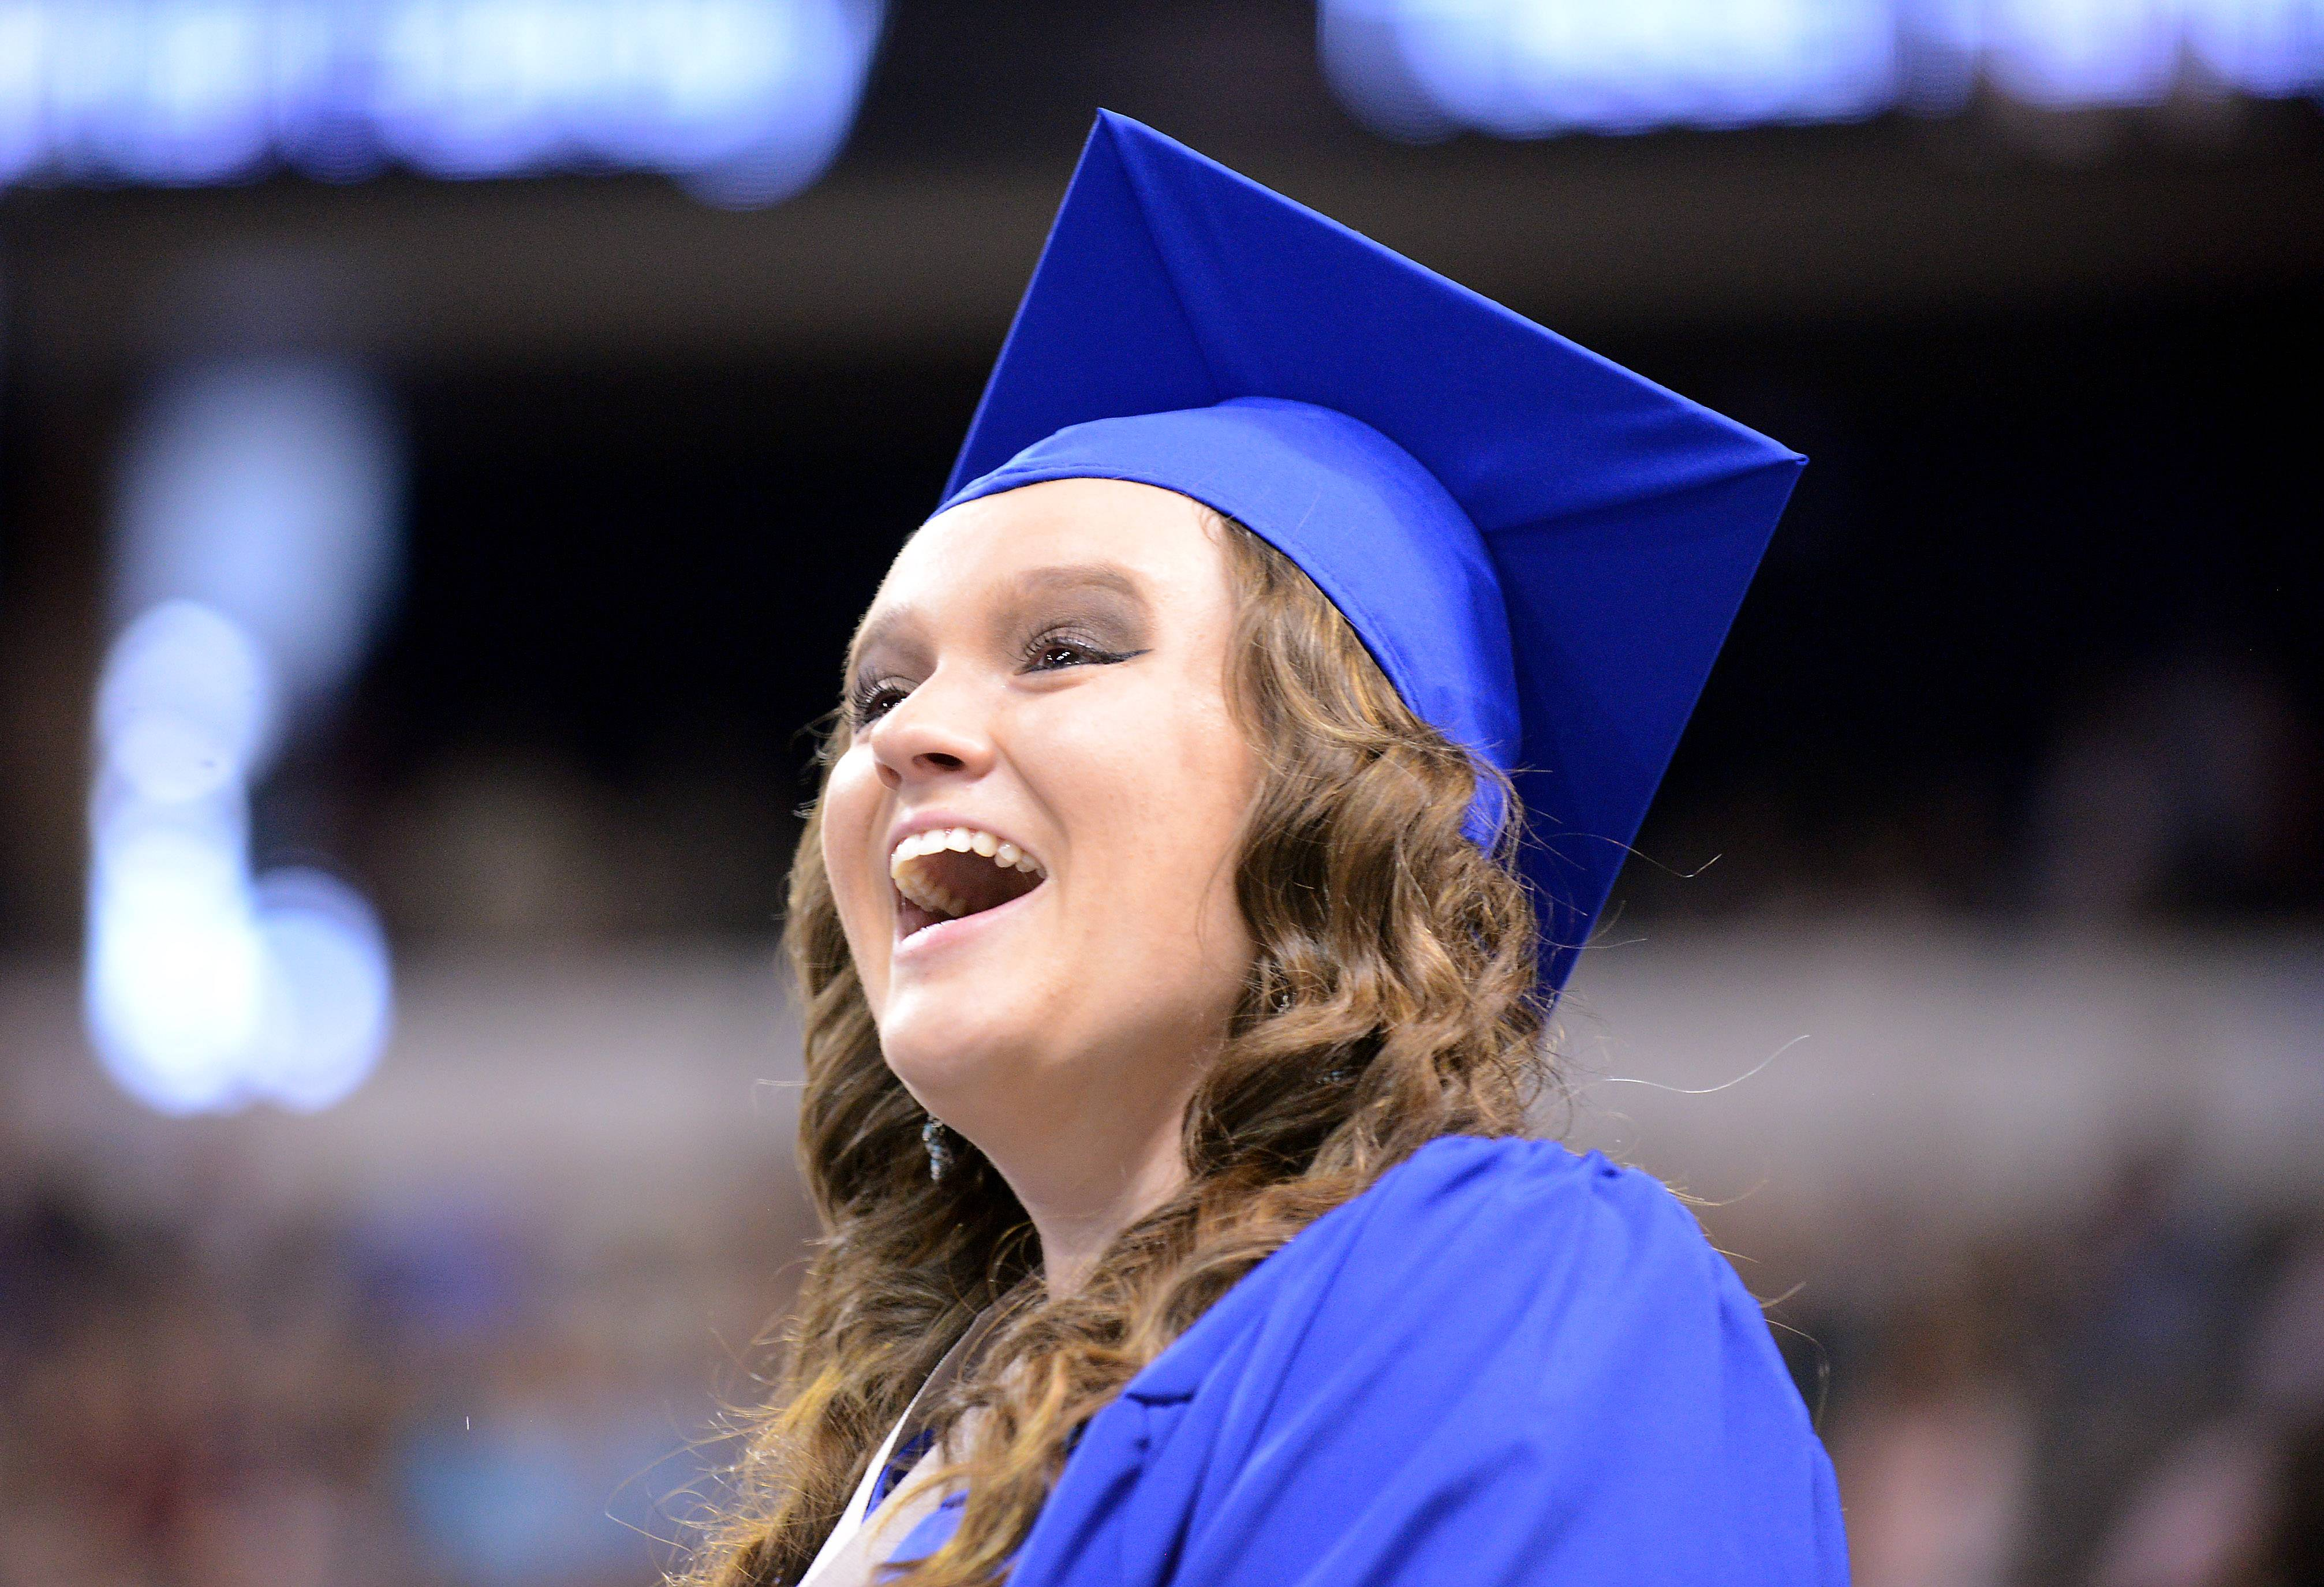 Images: St. Charles North High School graduation